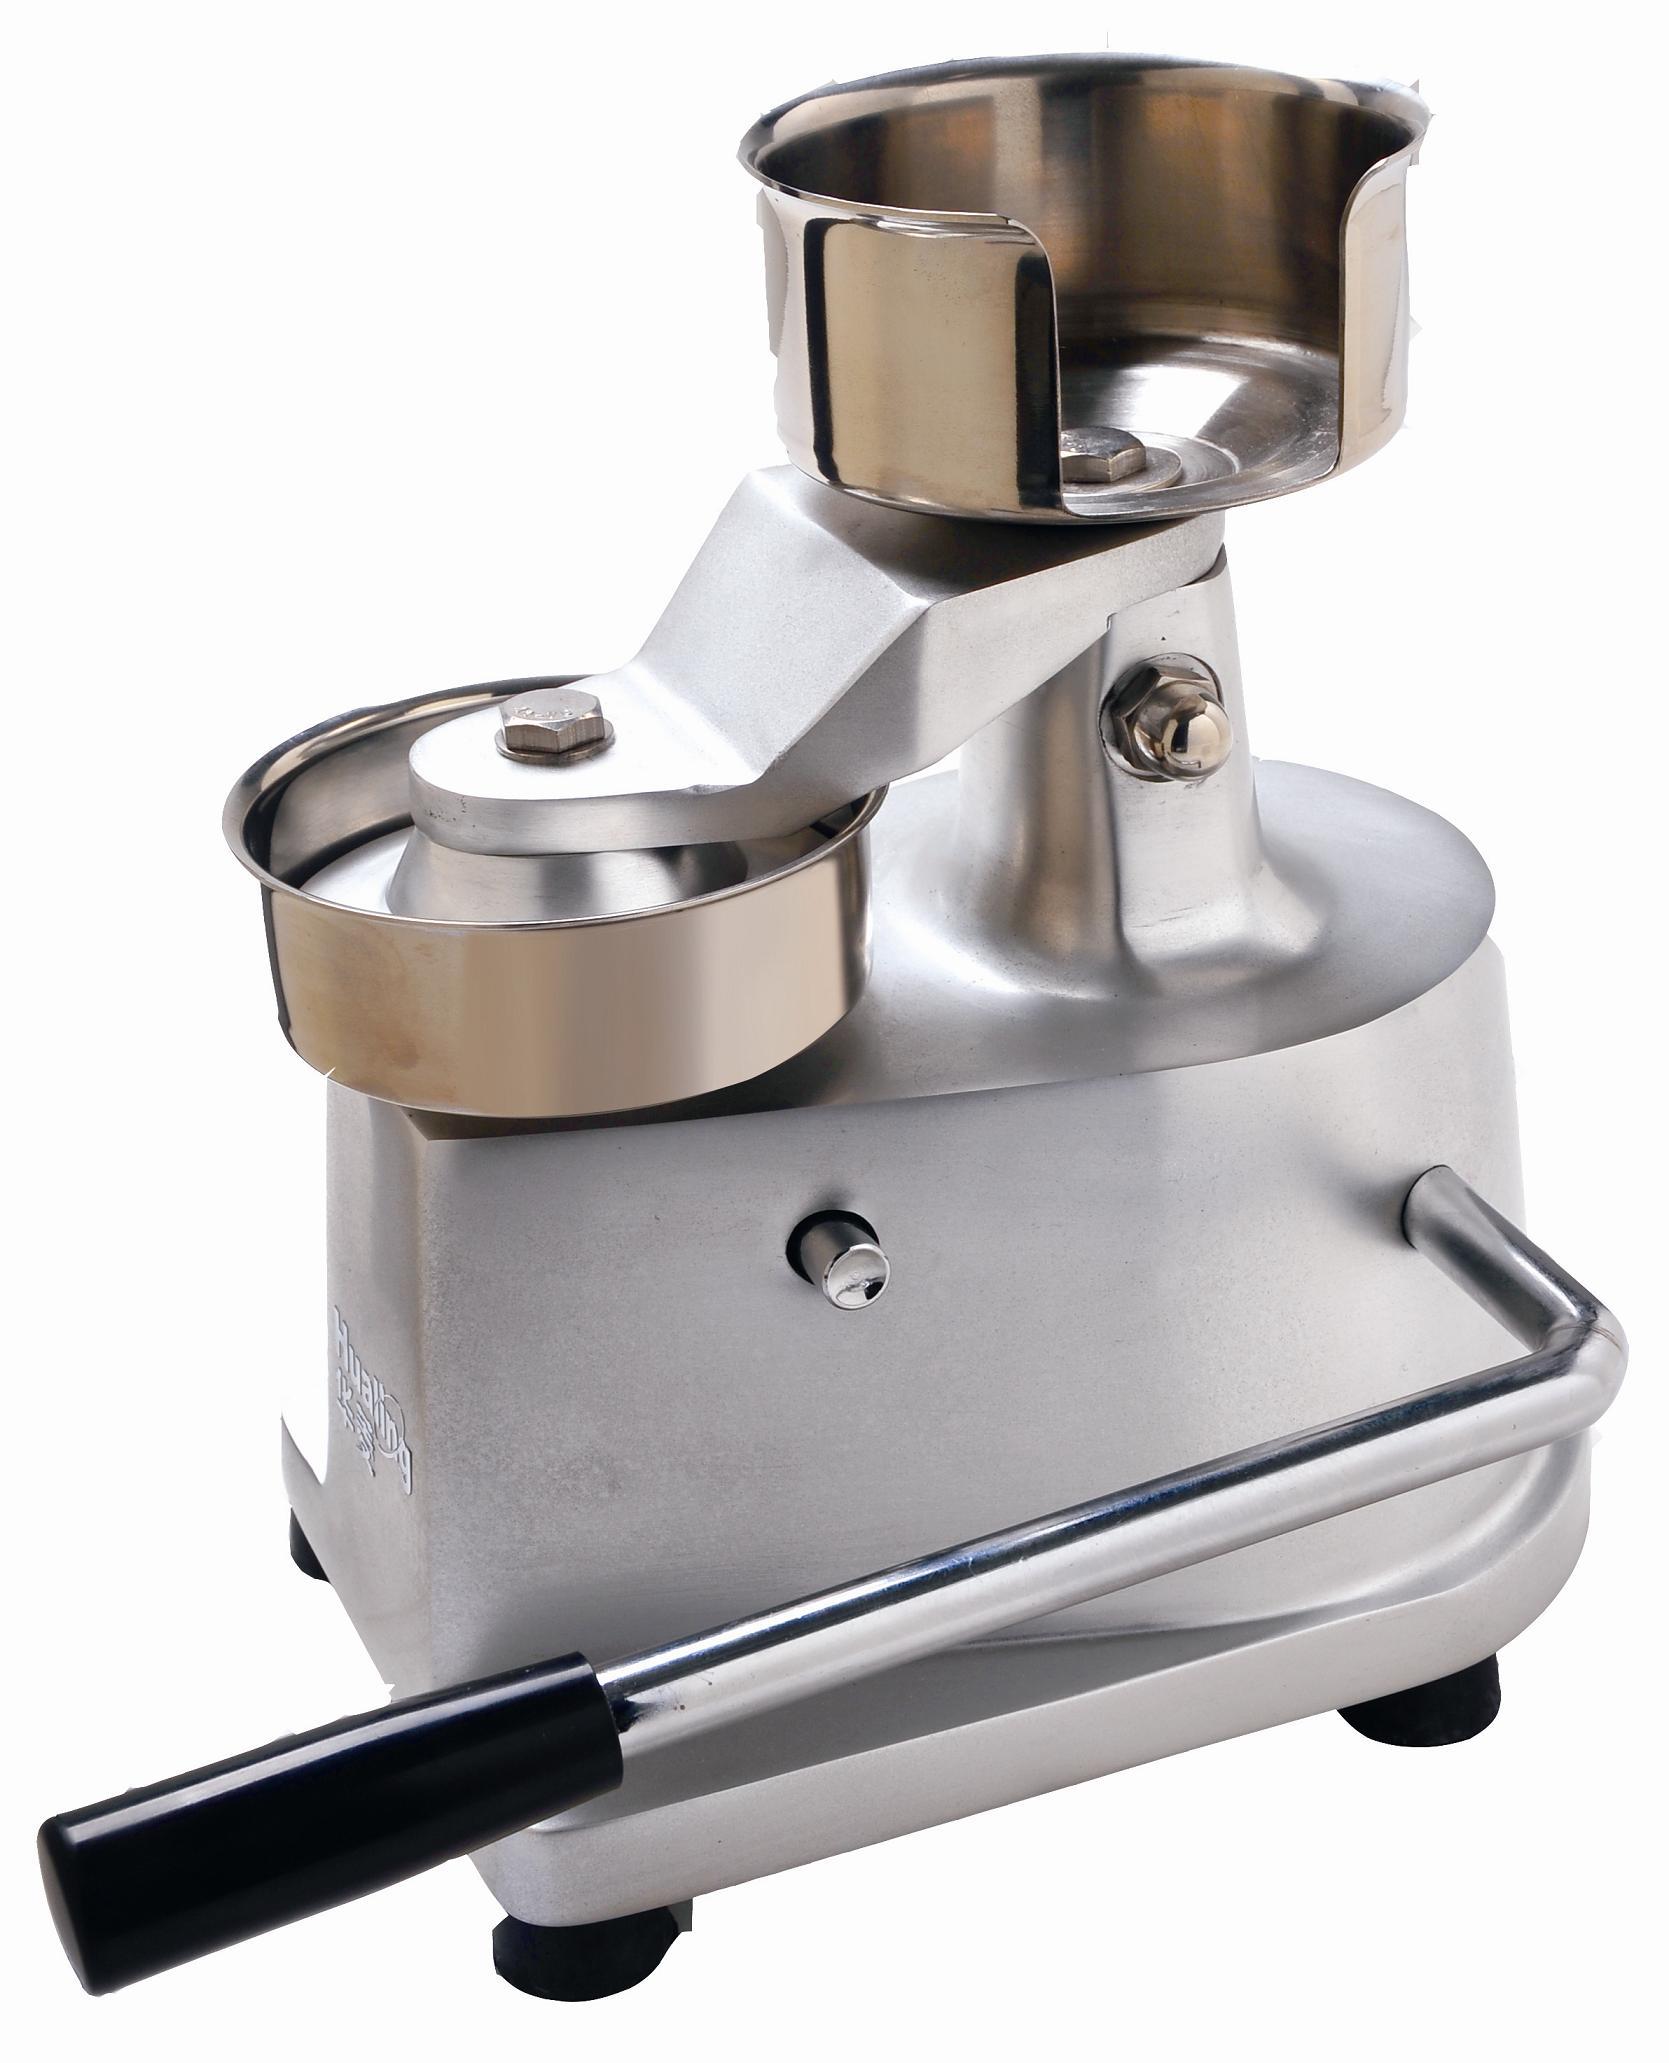 Eurodib USA HF100P hamburger press - accessories